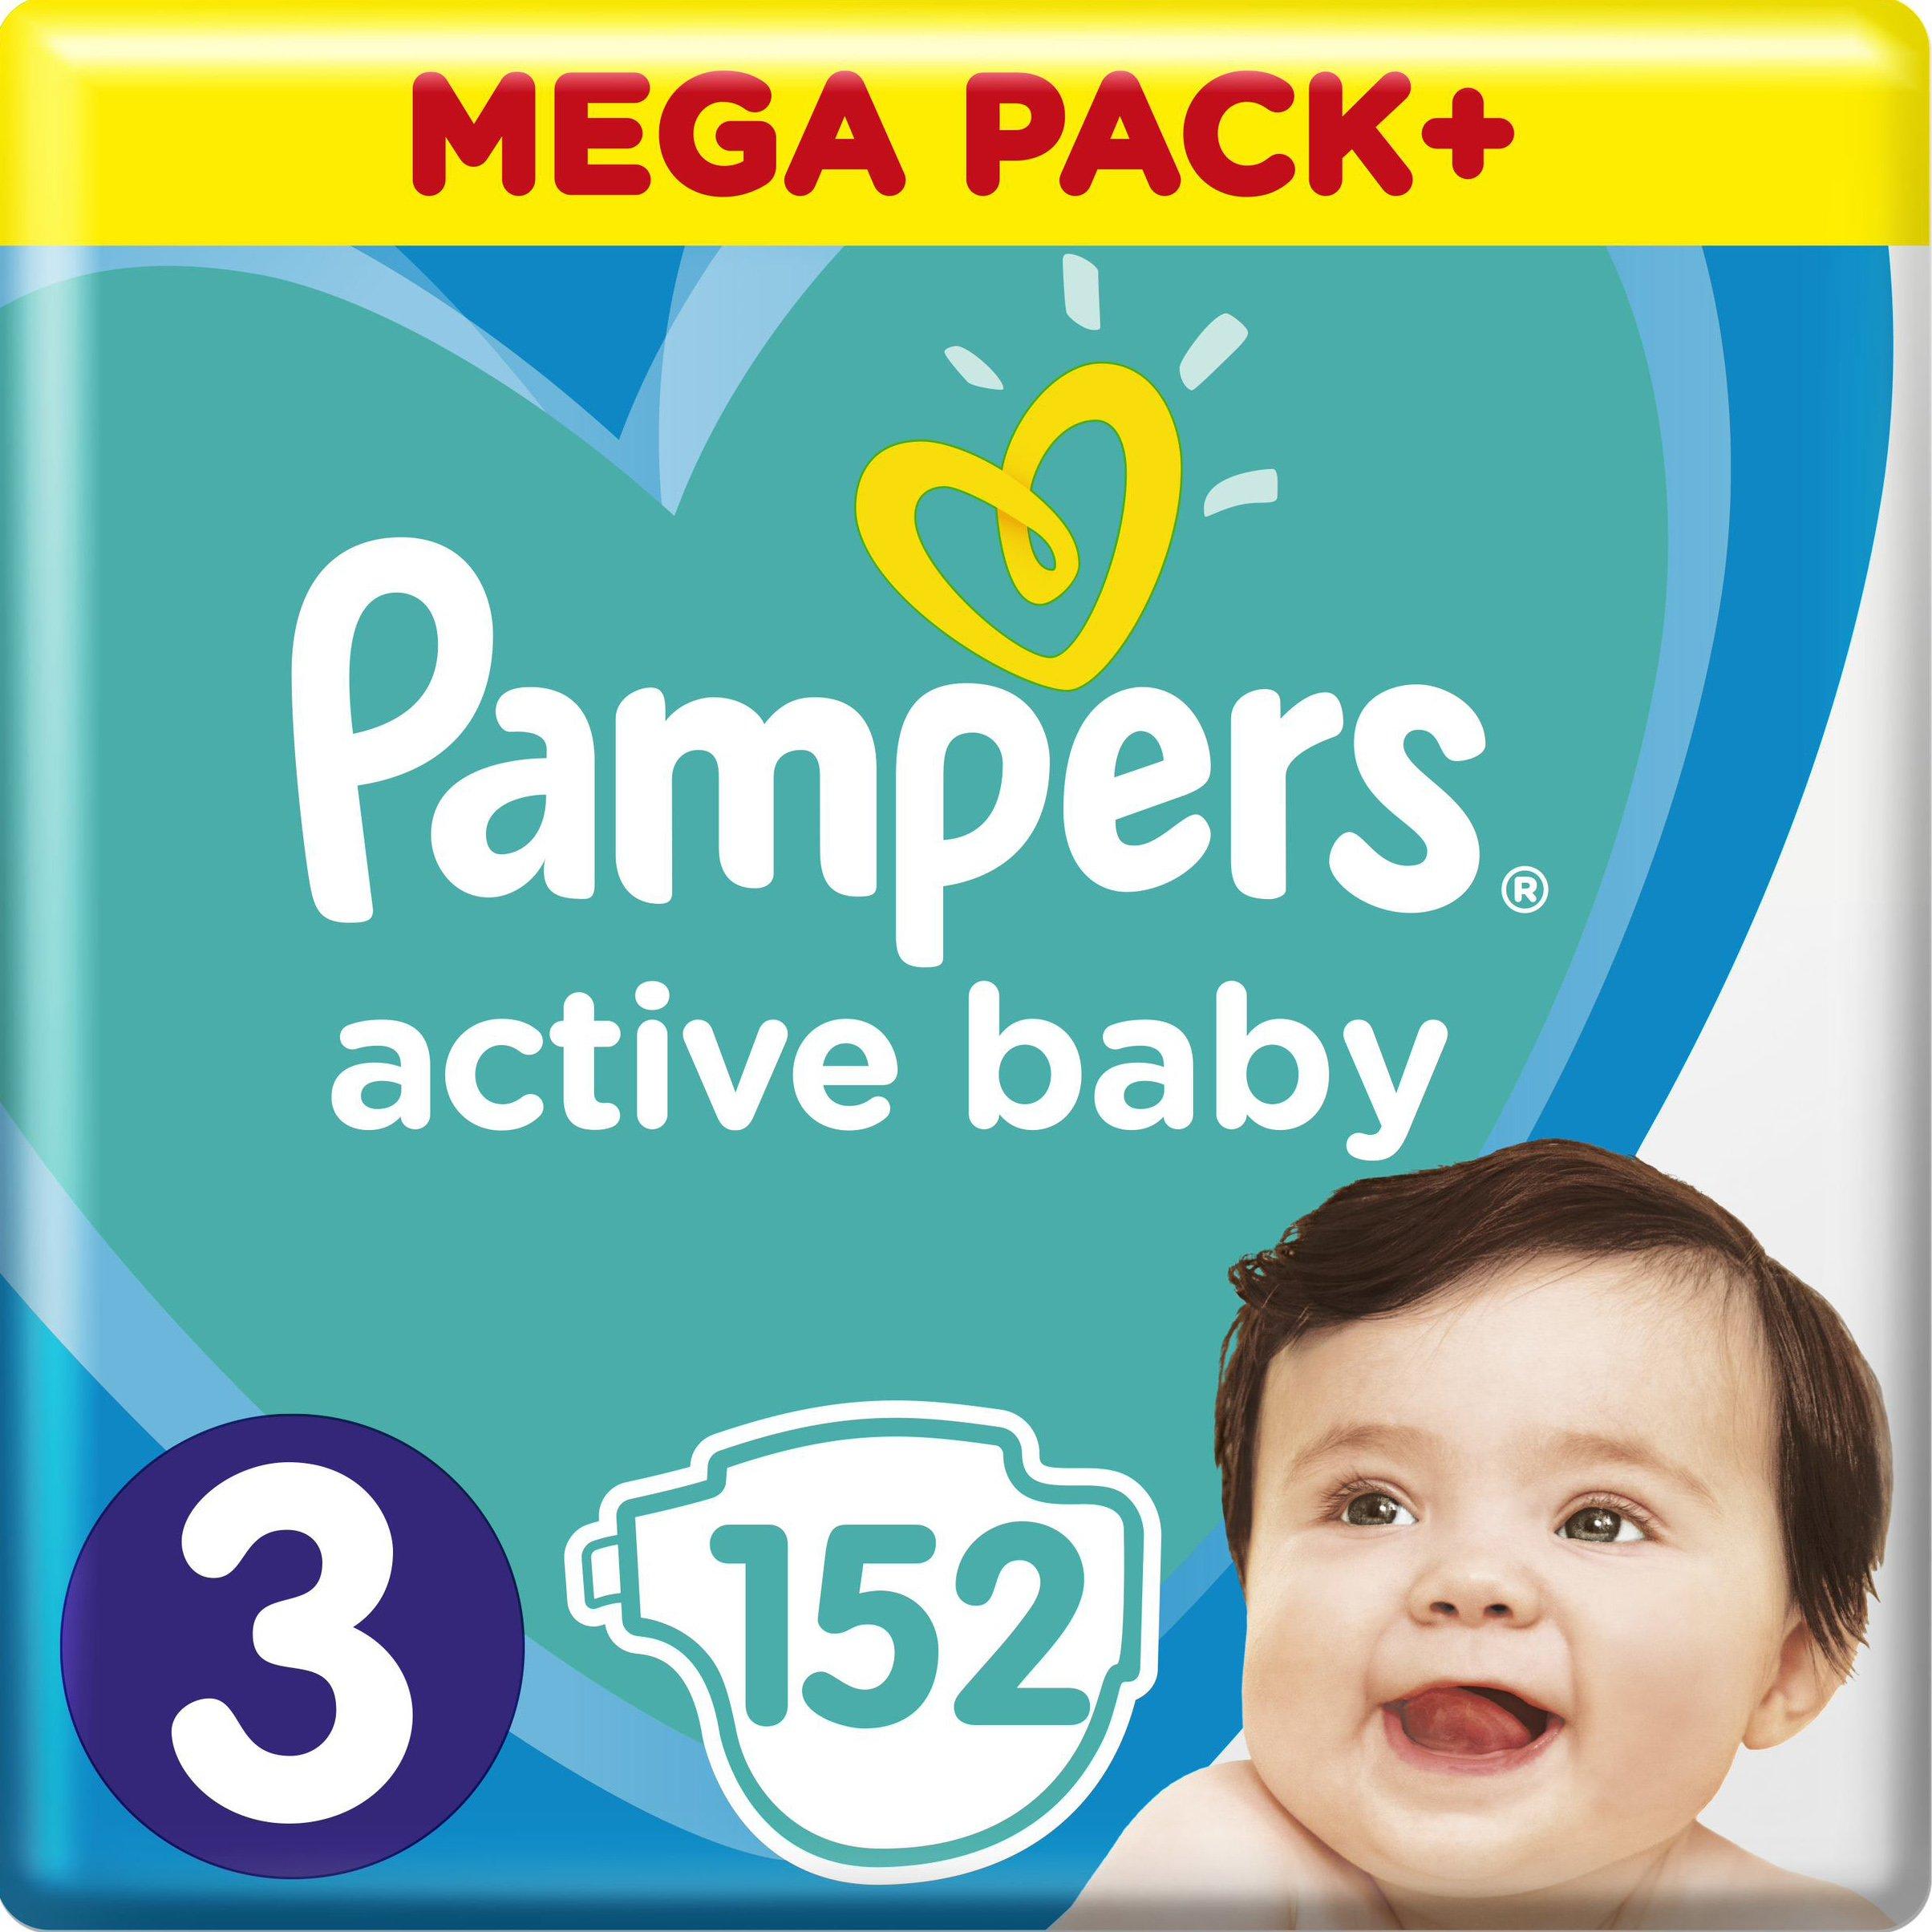 Pampers Active Baby Πάνες Mega Pack Νο3 (6-10 kg), 152 Πάνες μητέρα παιδί   περιποίηση για το μωρό   πάνες για το μωρό